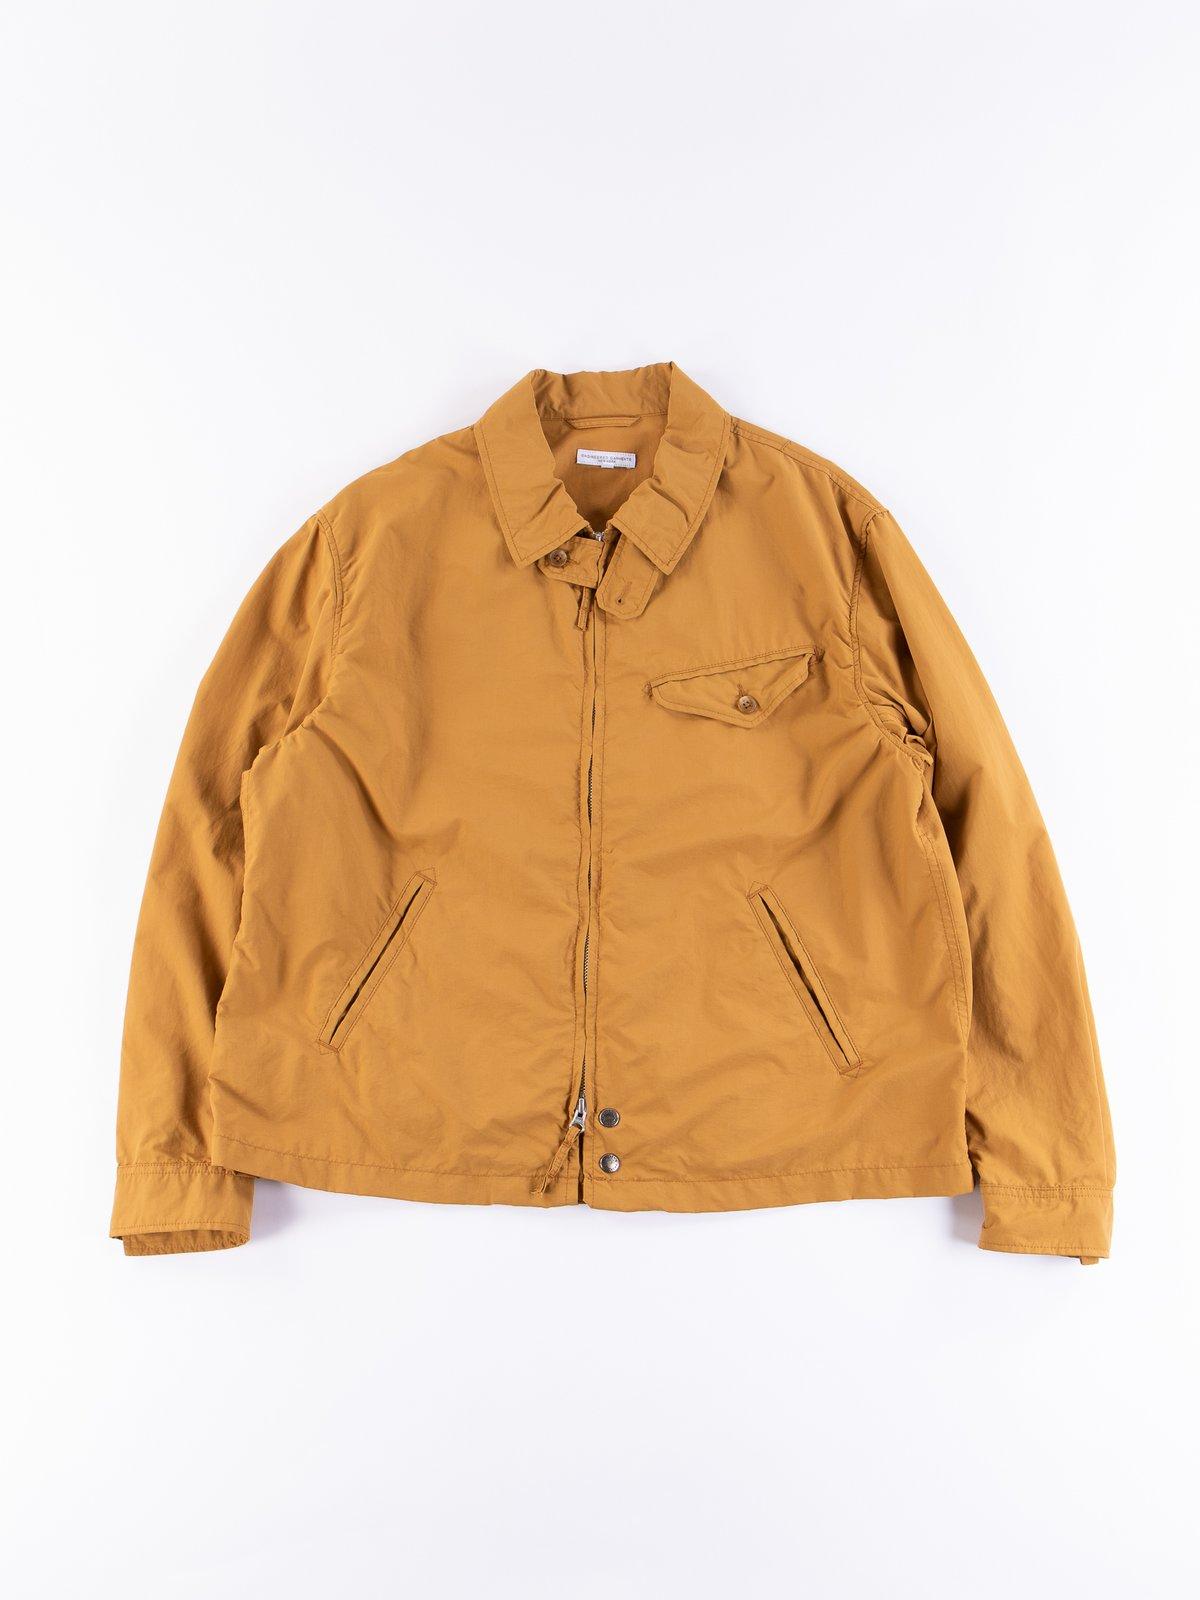 Mustard Acrylic Coated Nylon Taffeta Driver Jacket - Image 1